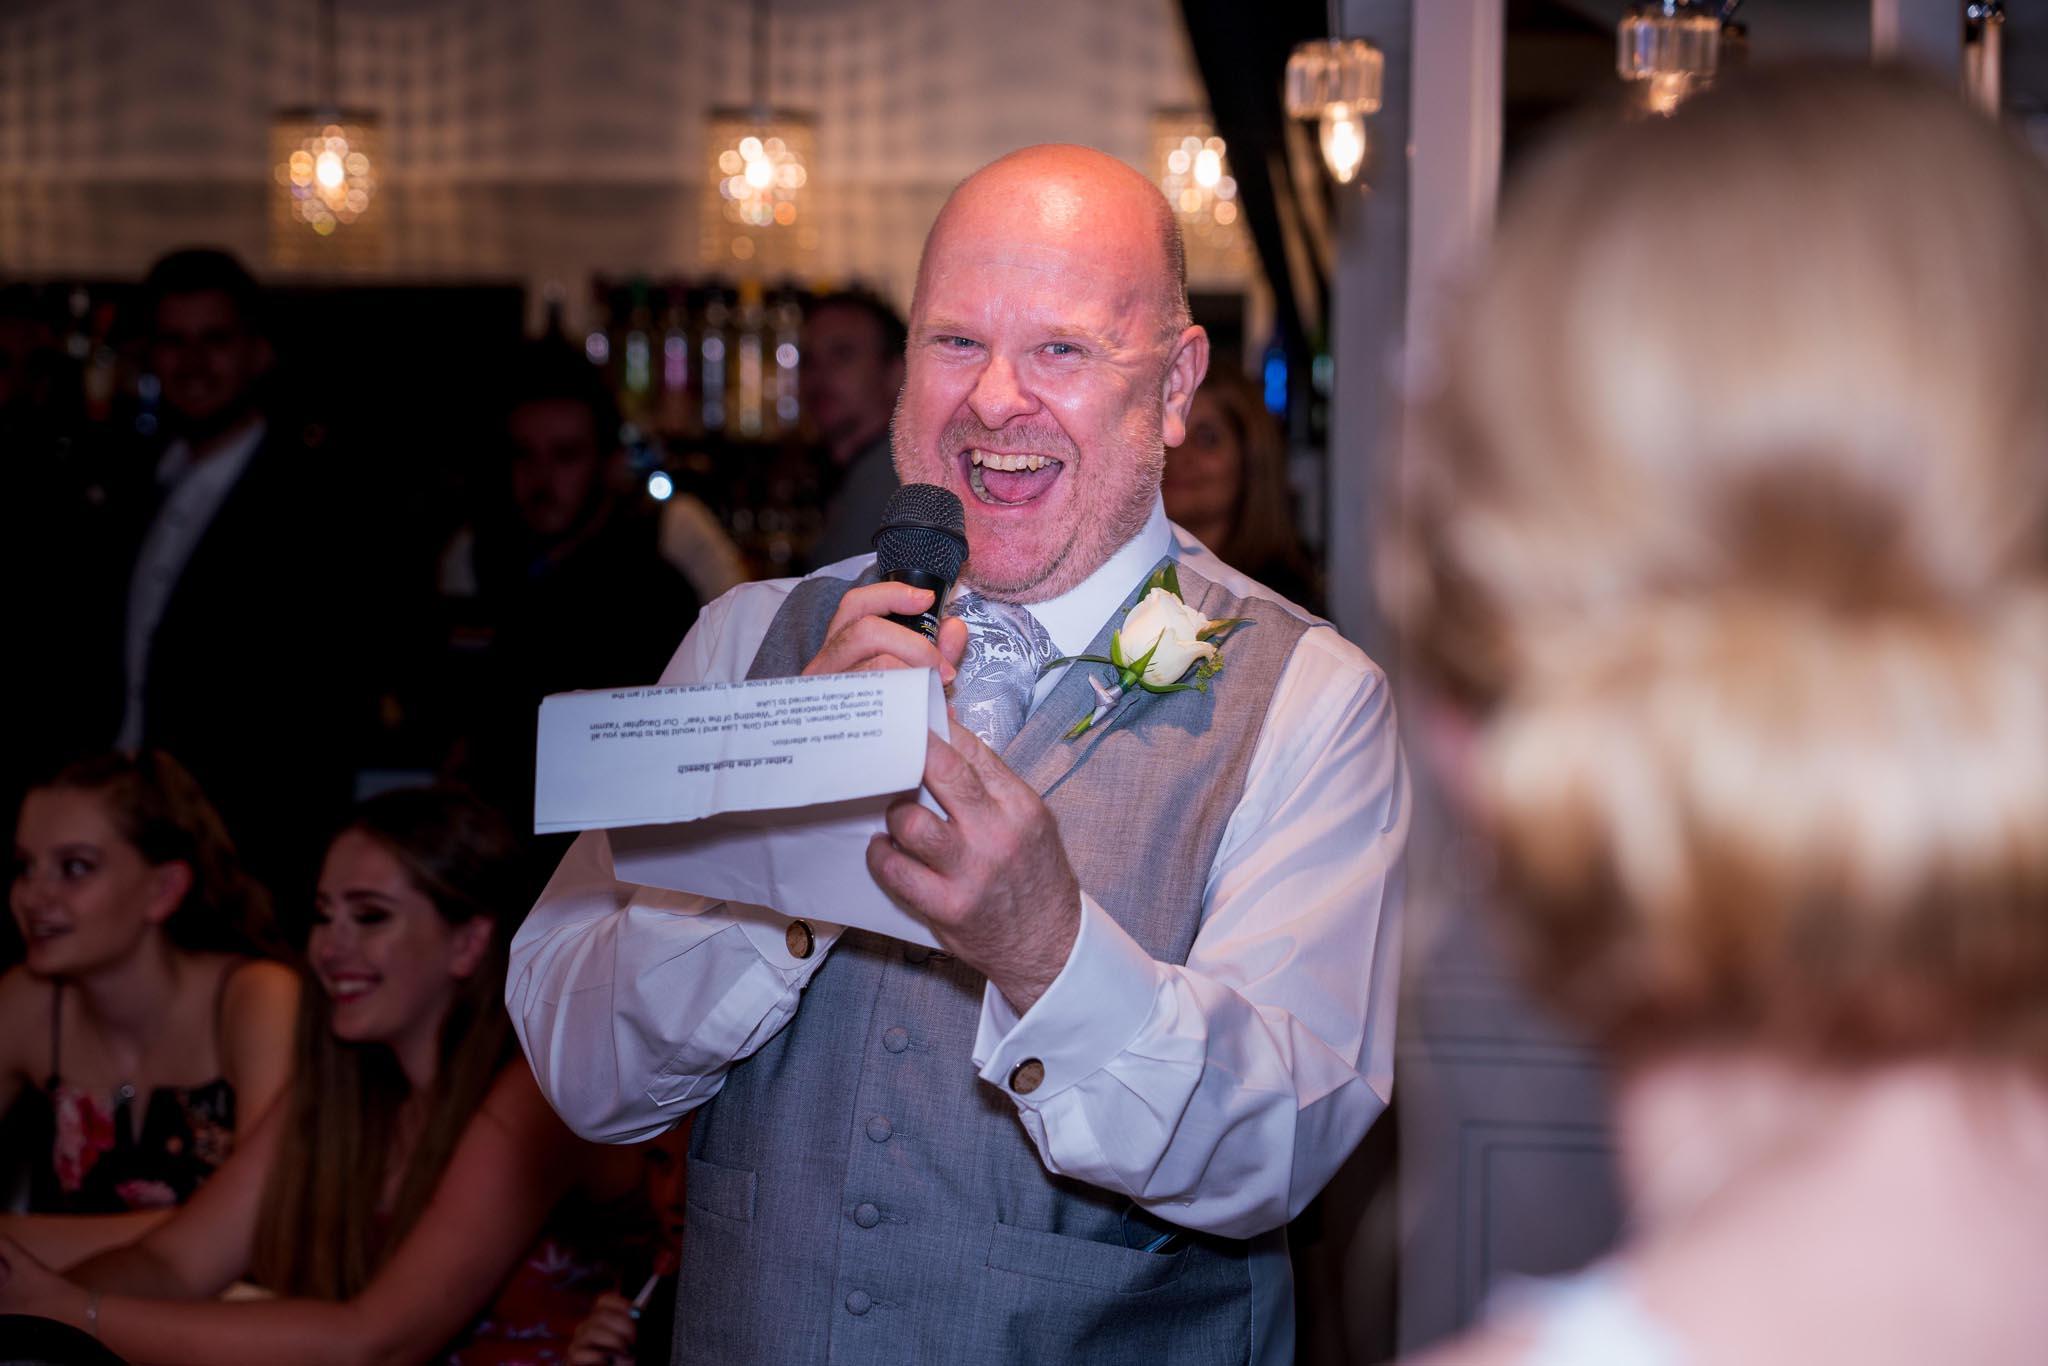 881-Speeches-Luke-Yasmin-The-Rayleigh-Club-Wedding-Photography.jpg